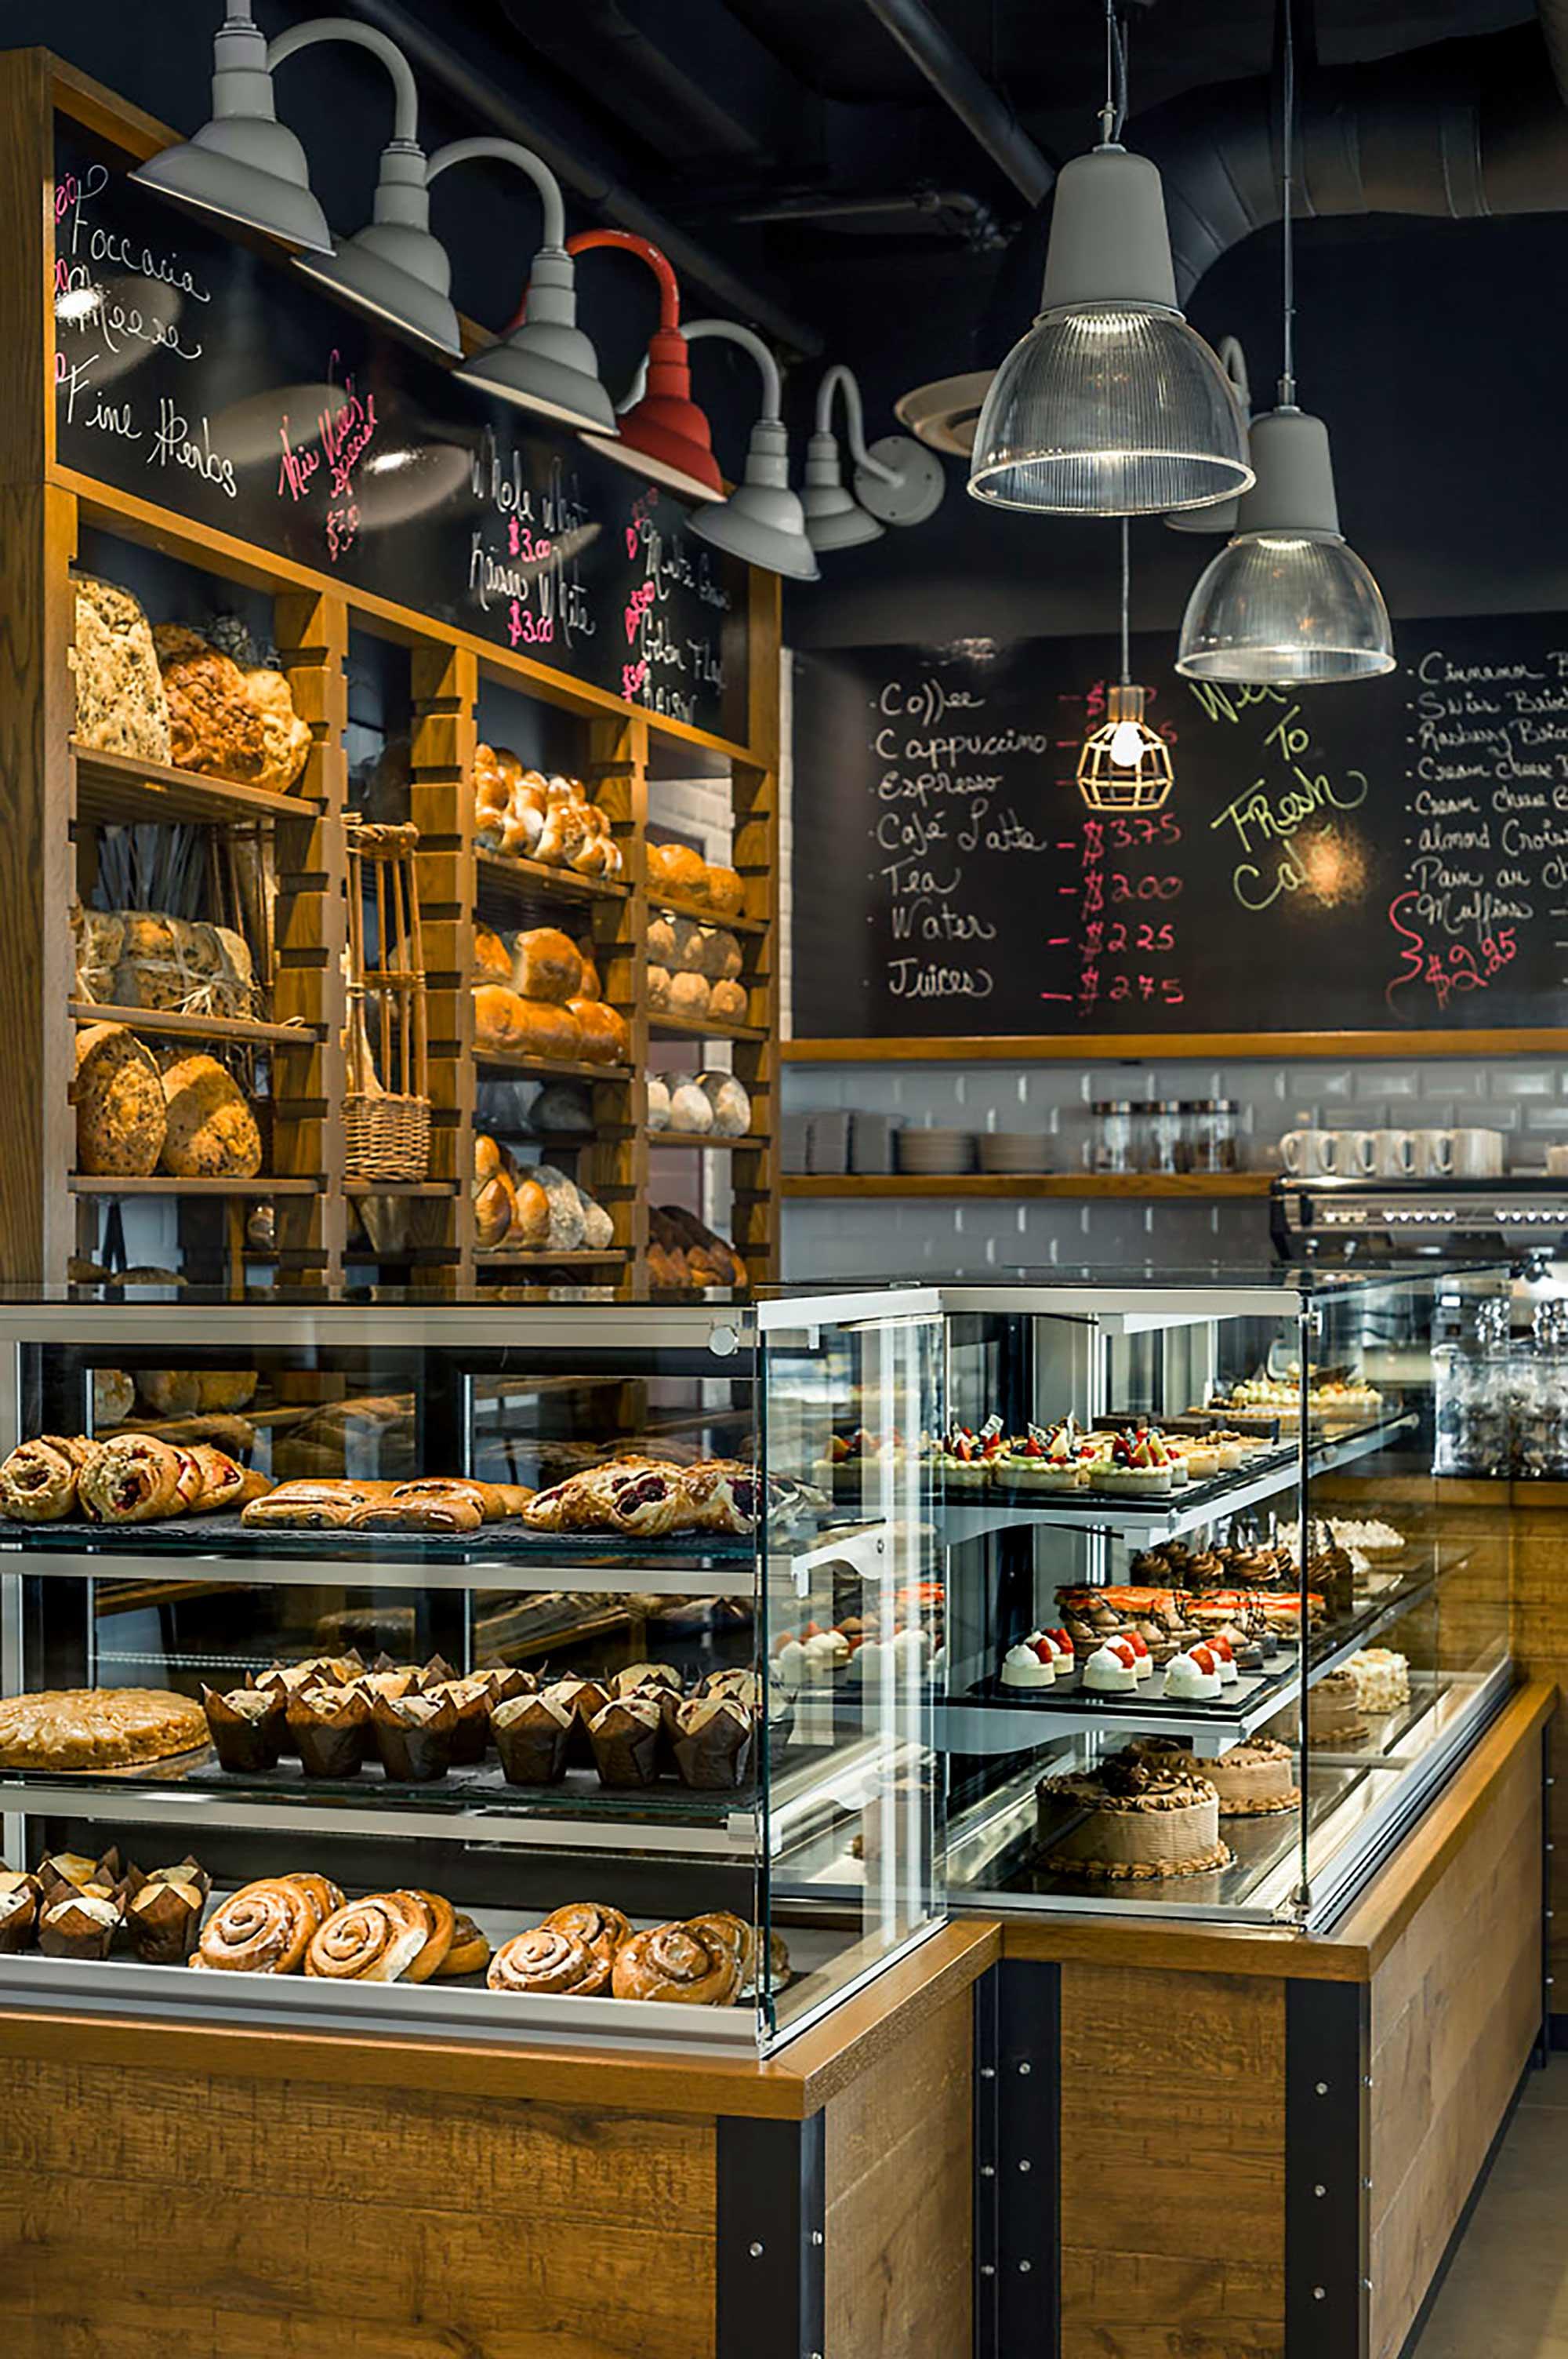 interior-design-cafe-display-case-counter.jpg